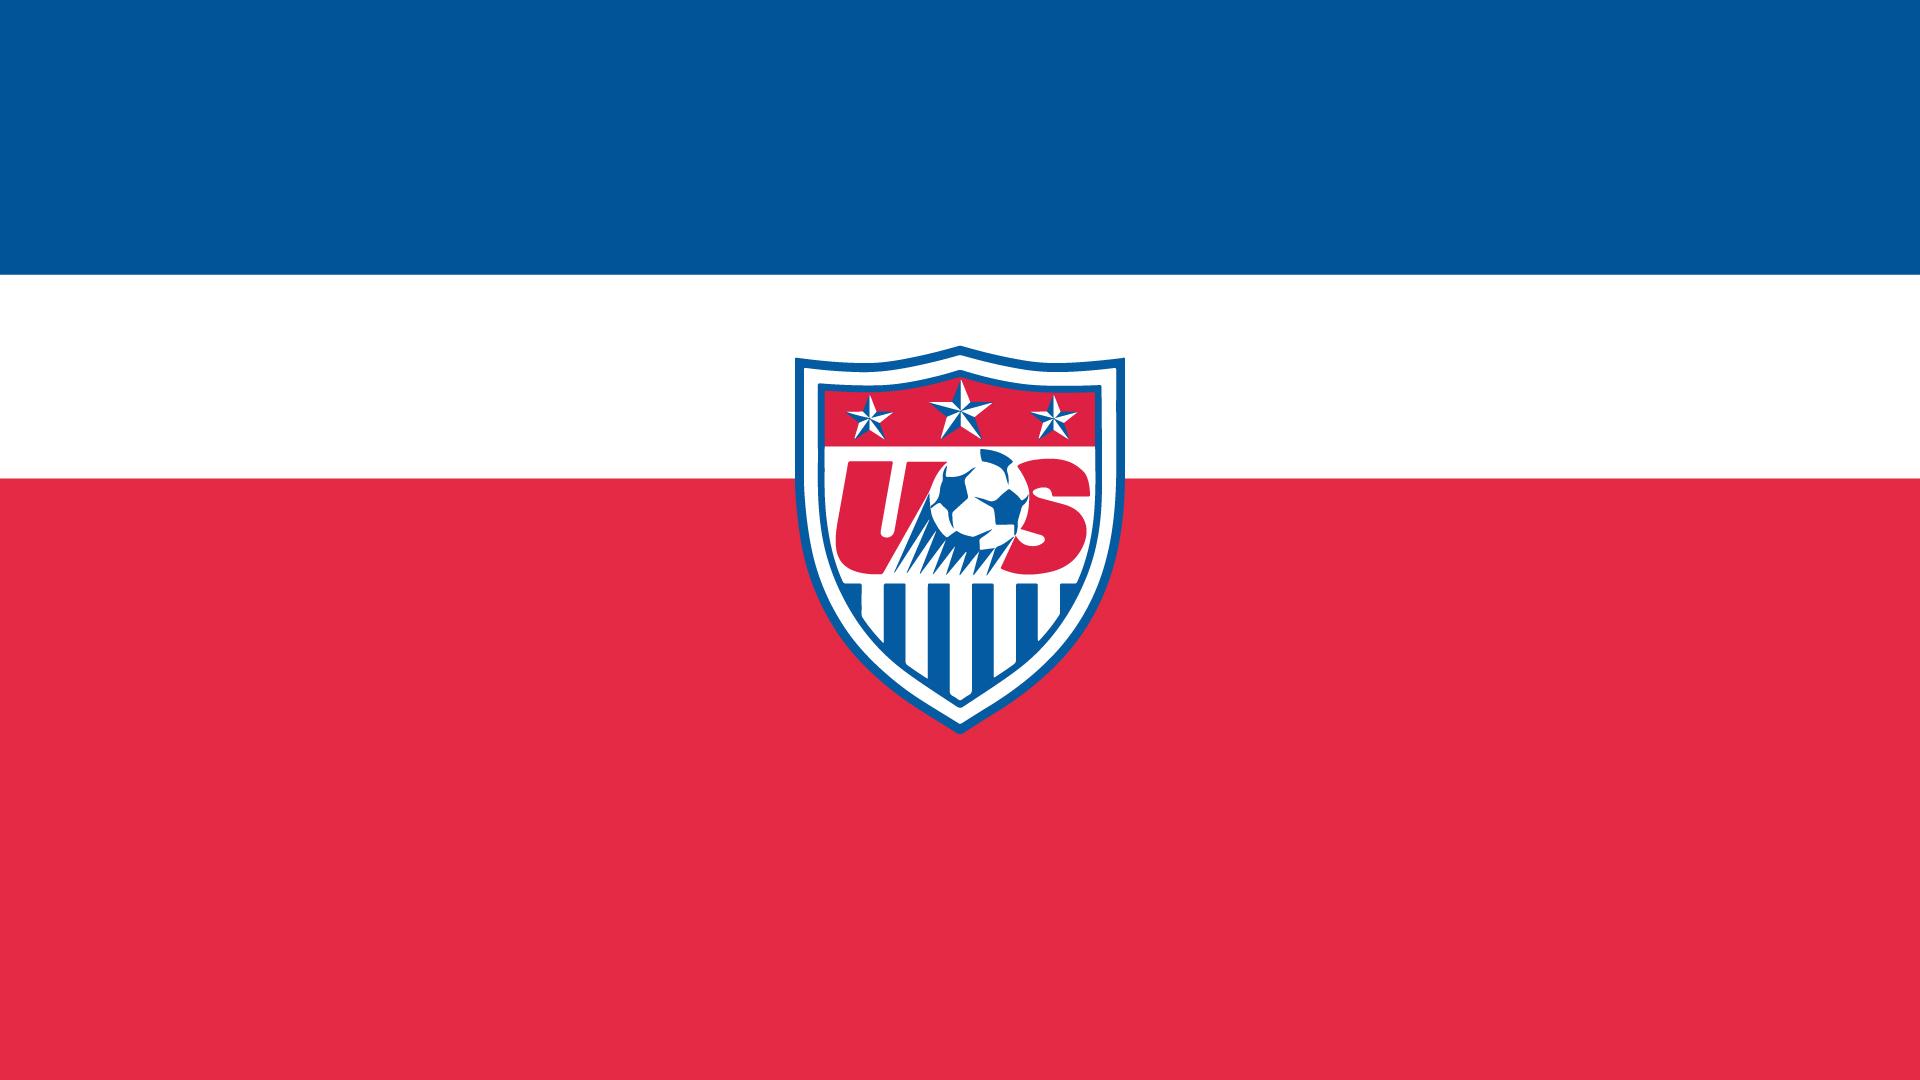 31] Usa Soccer 2016 Wallpaper on WallpaperSafari 1920x1080